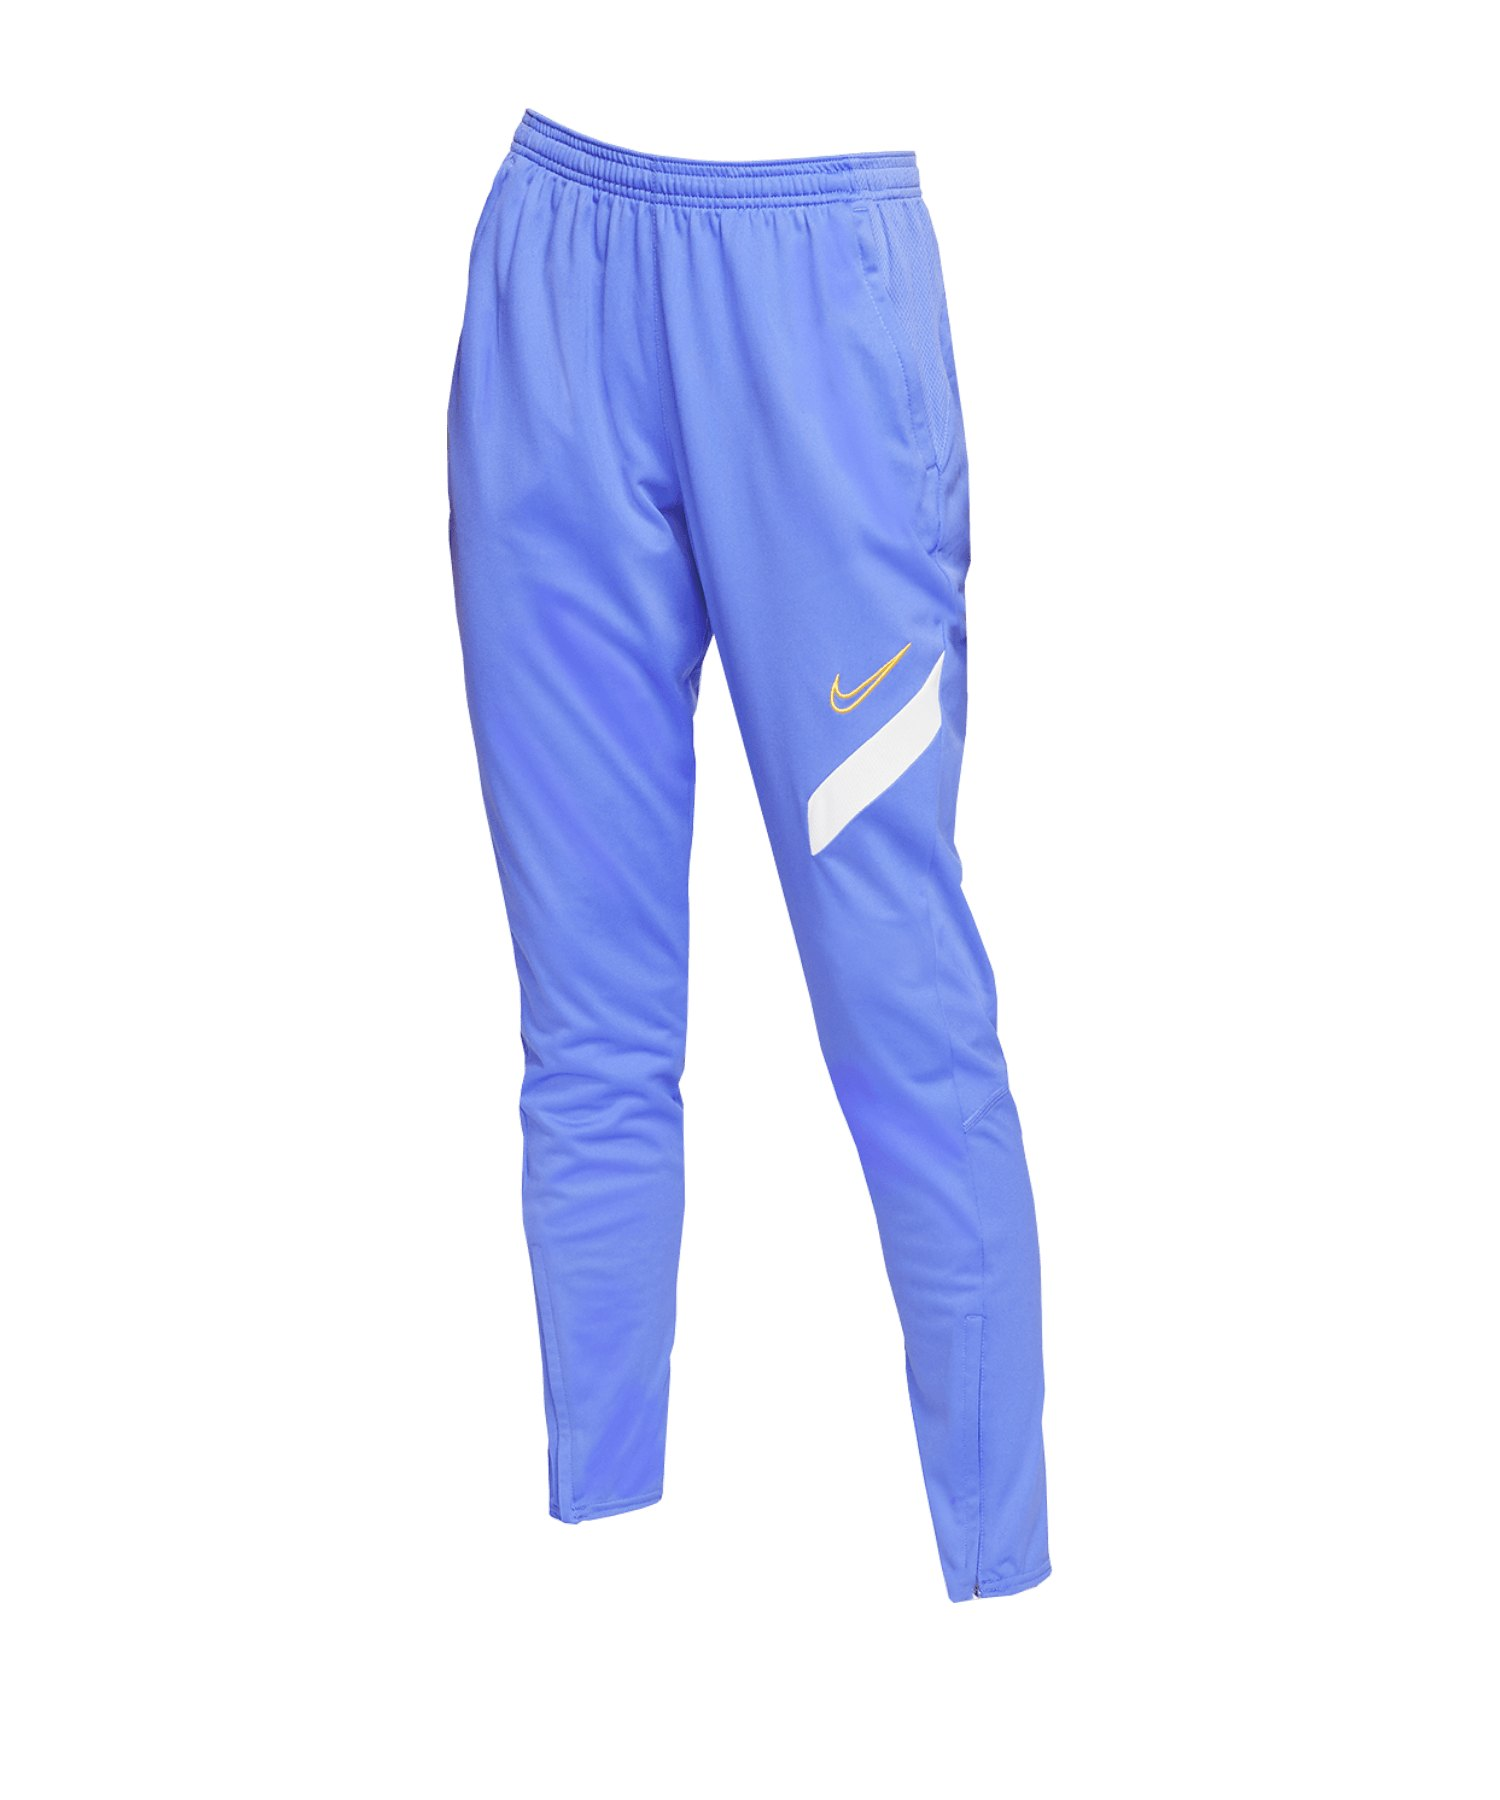 Nike Academy Pro Dri-FIT Hose lang Damen F500 - violett